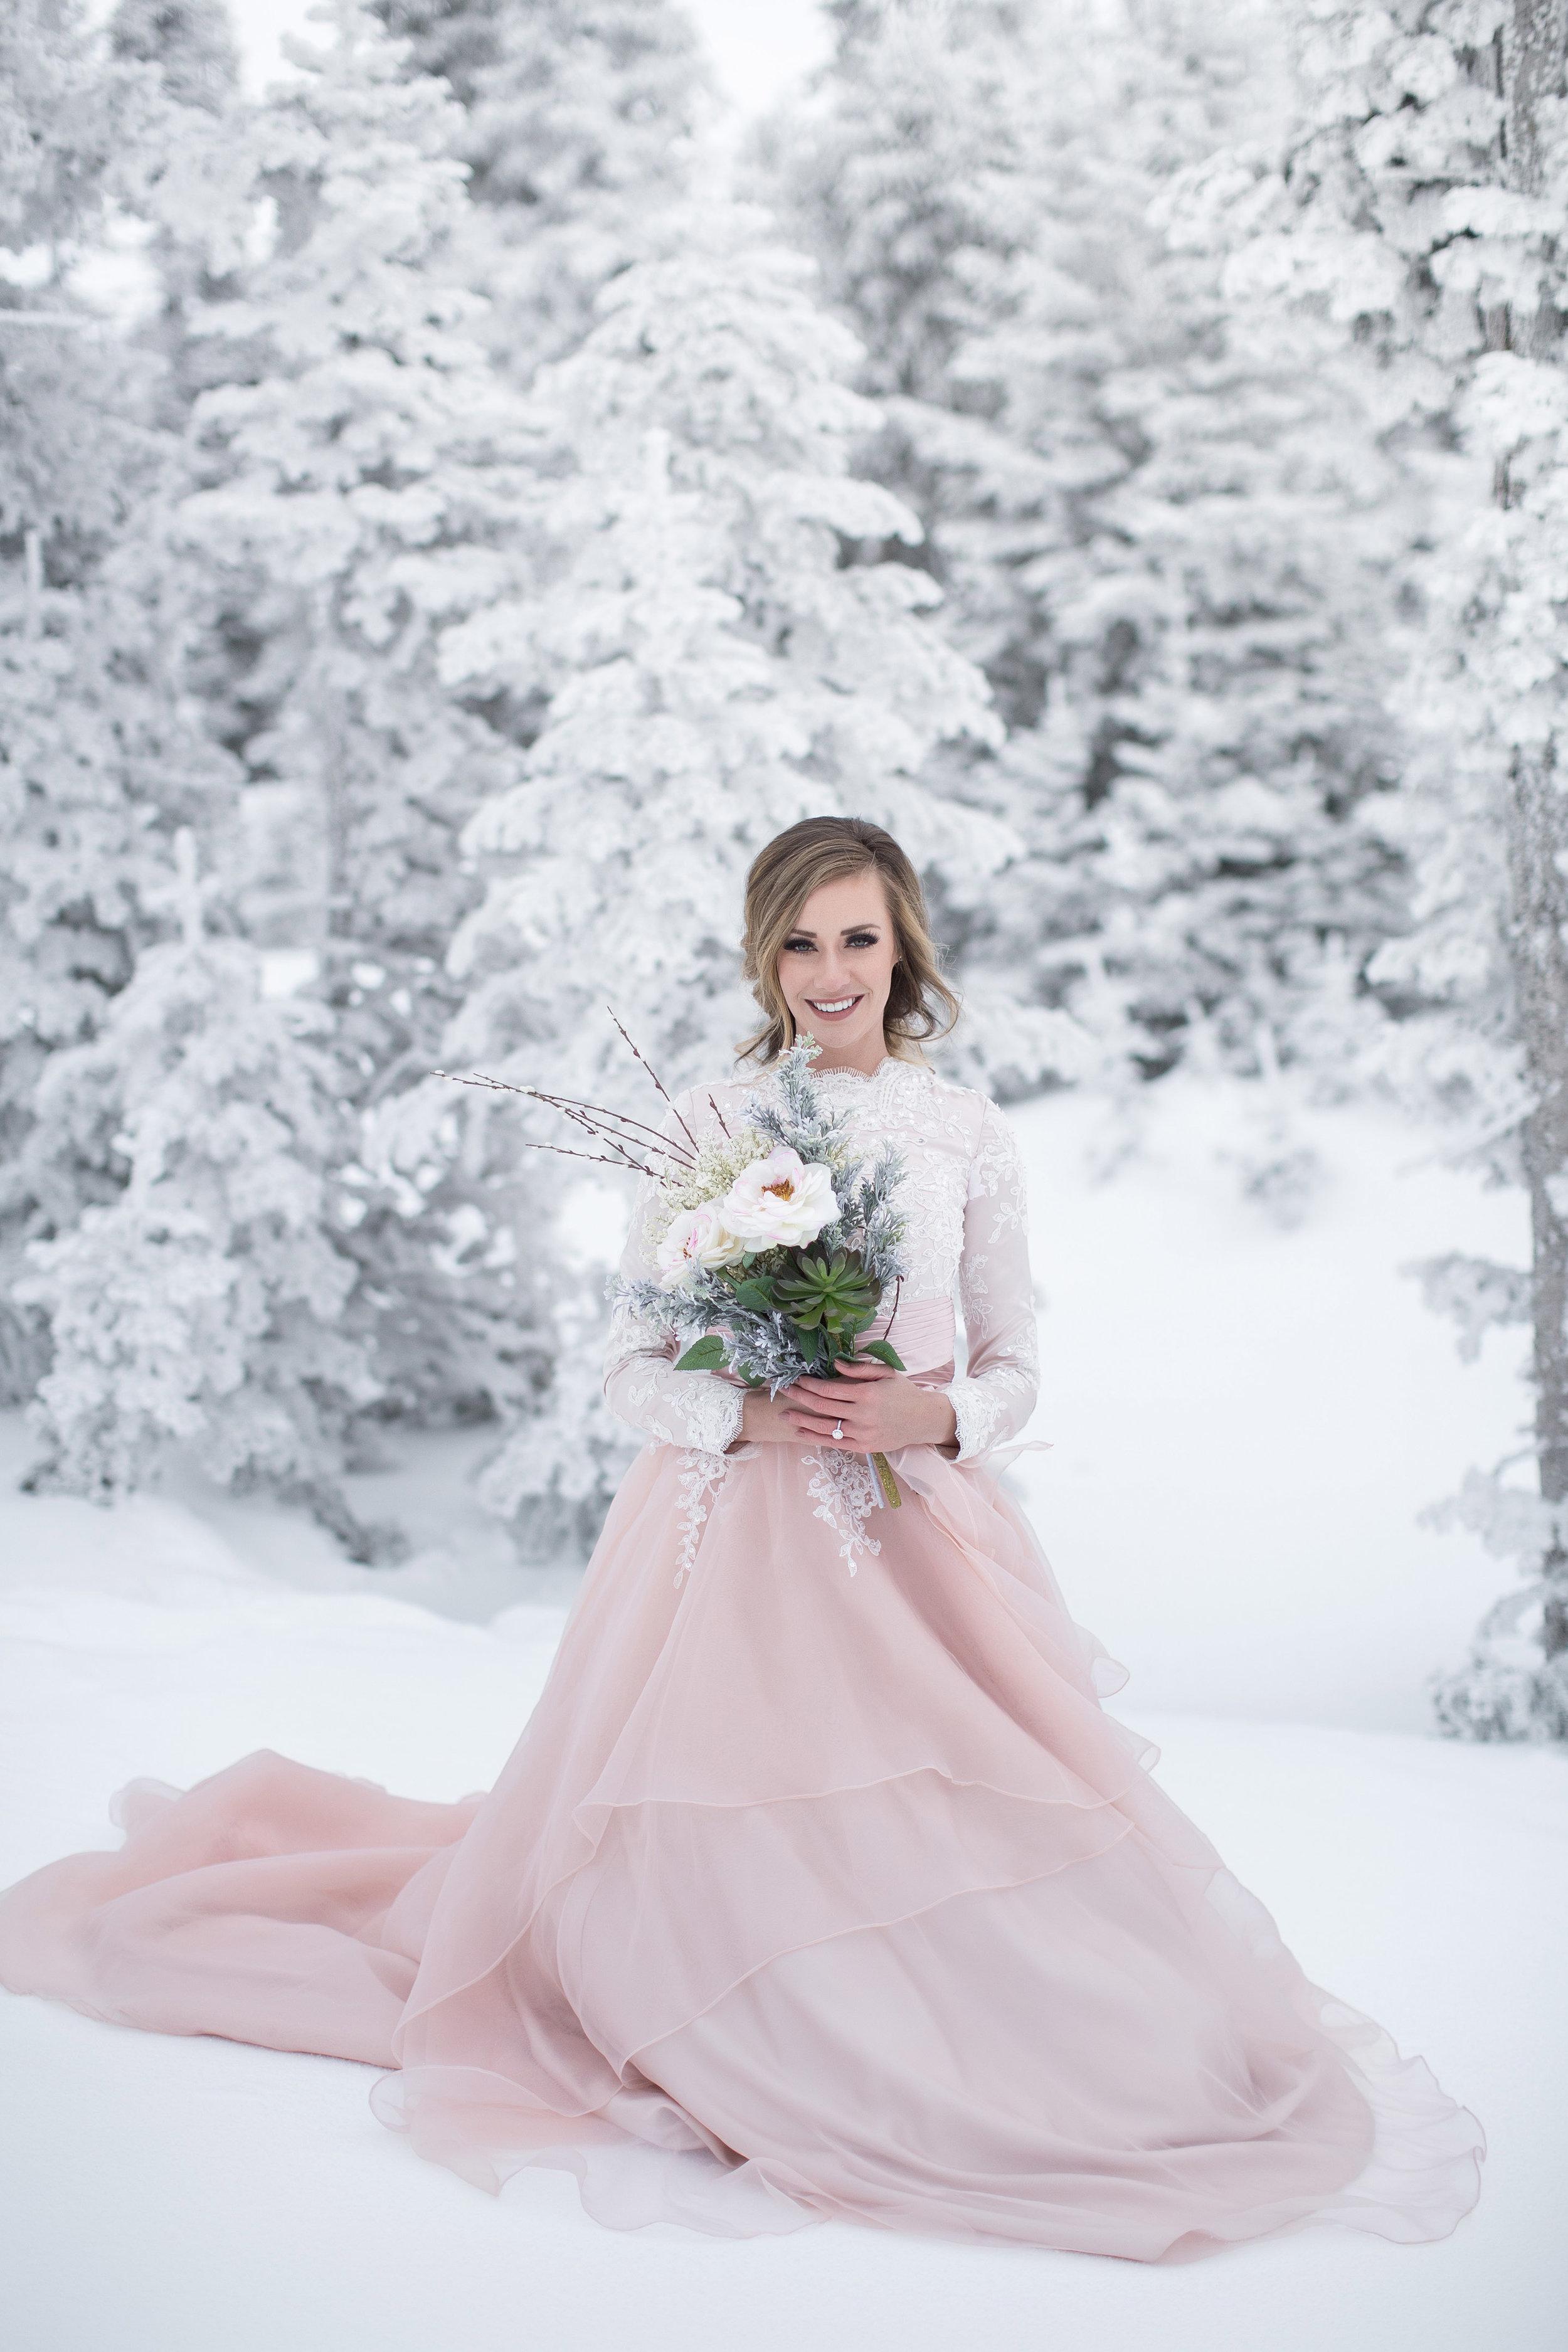 JessicaPorterBridals (29 of 61).jpg